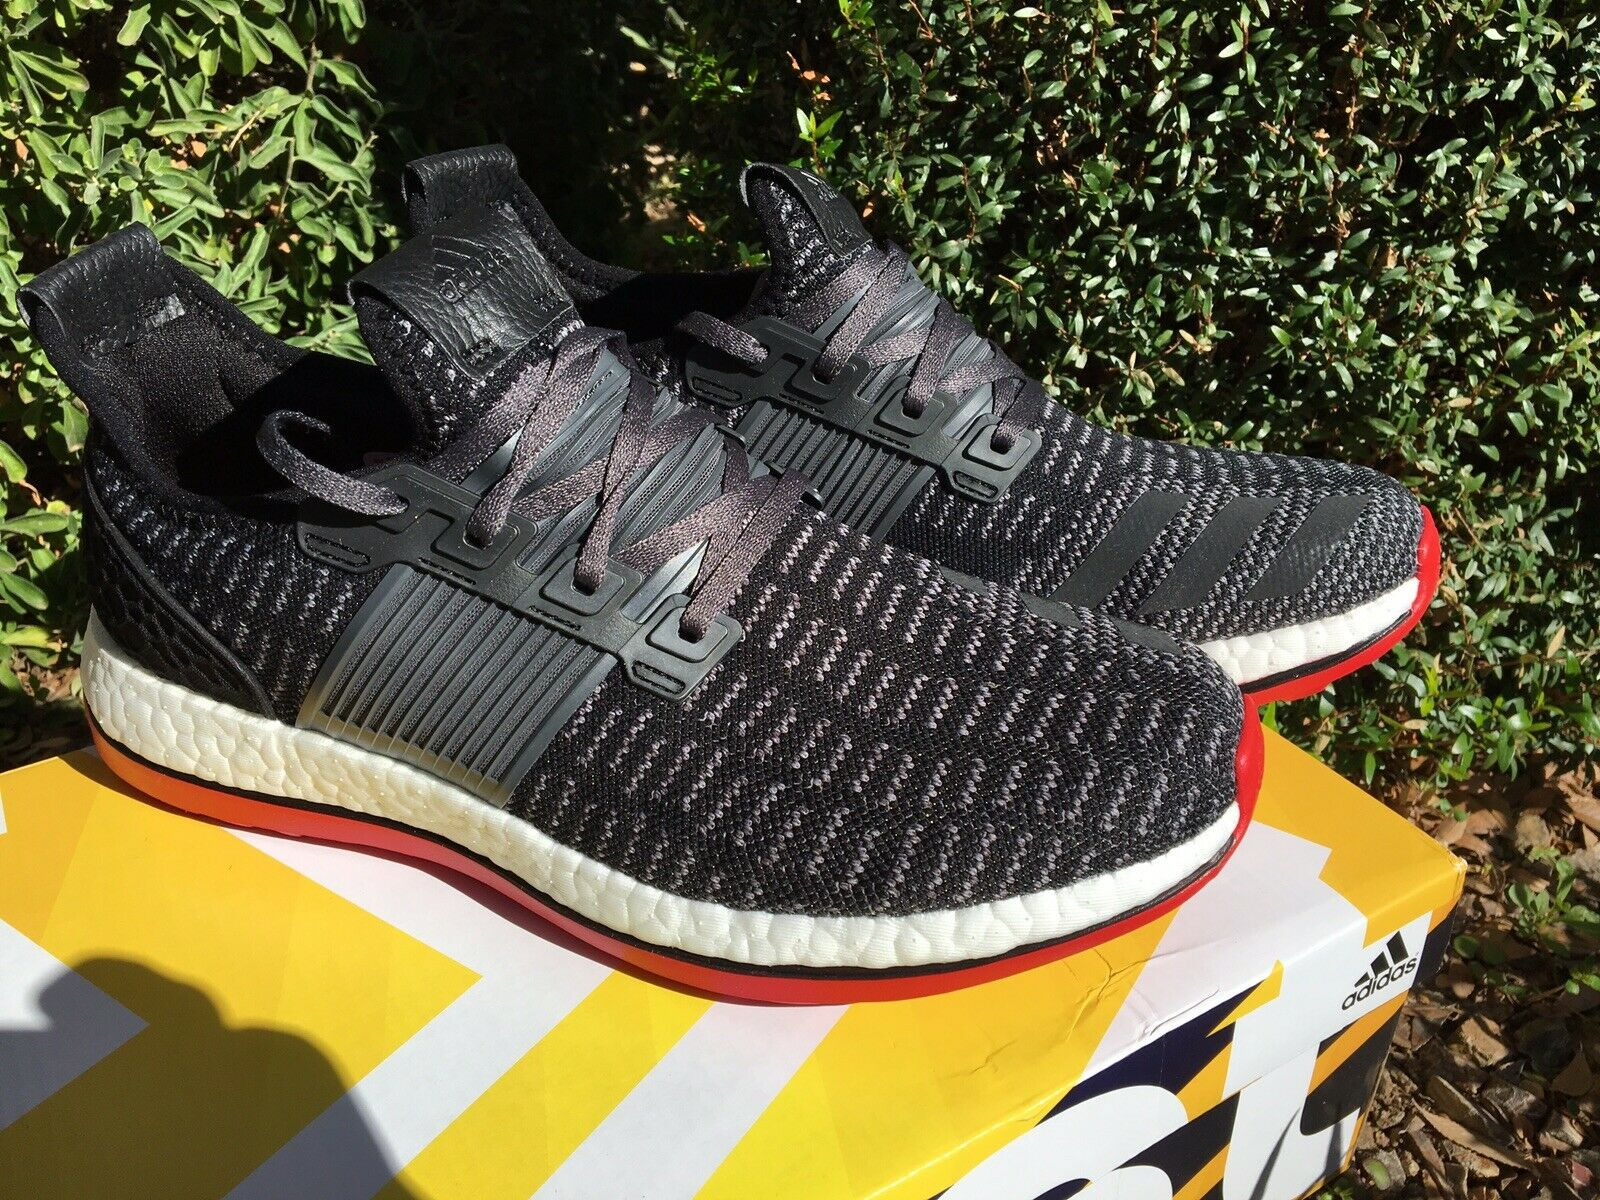 NEW Adidas Pureboost ZG Prime AQ6761 Men's Running Size 9.5